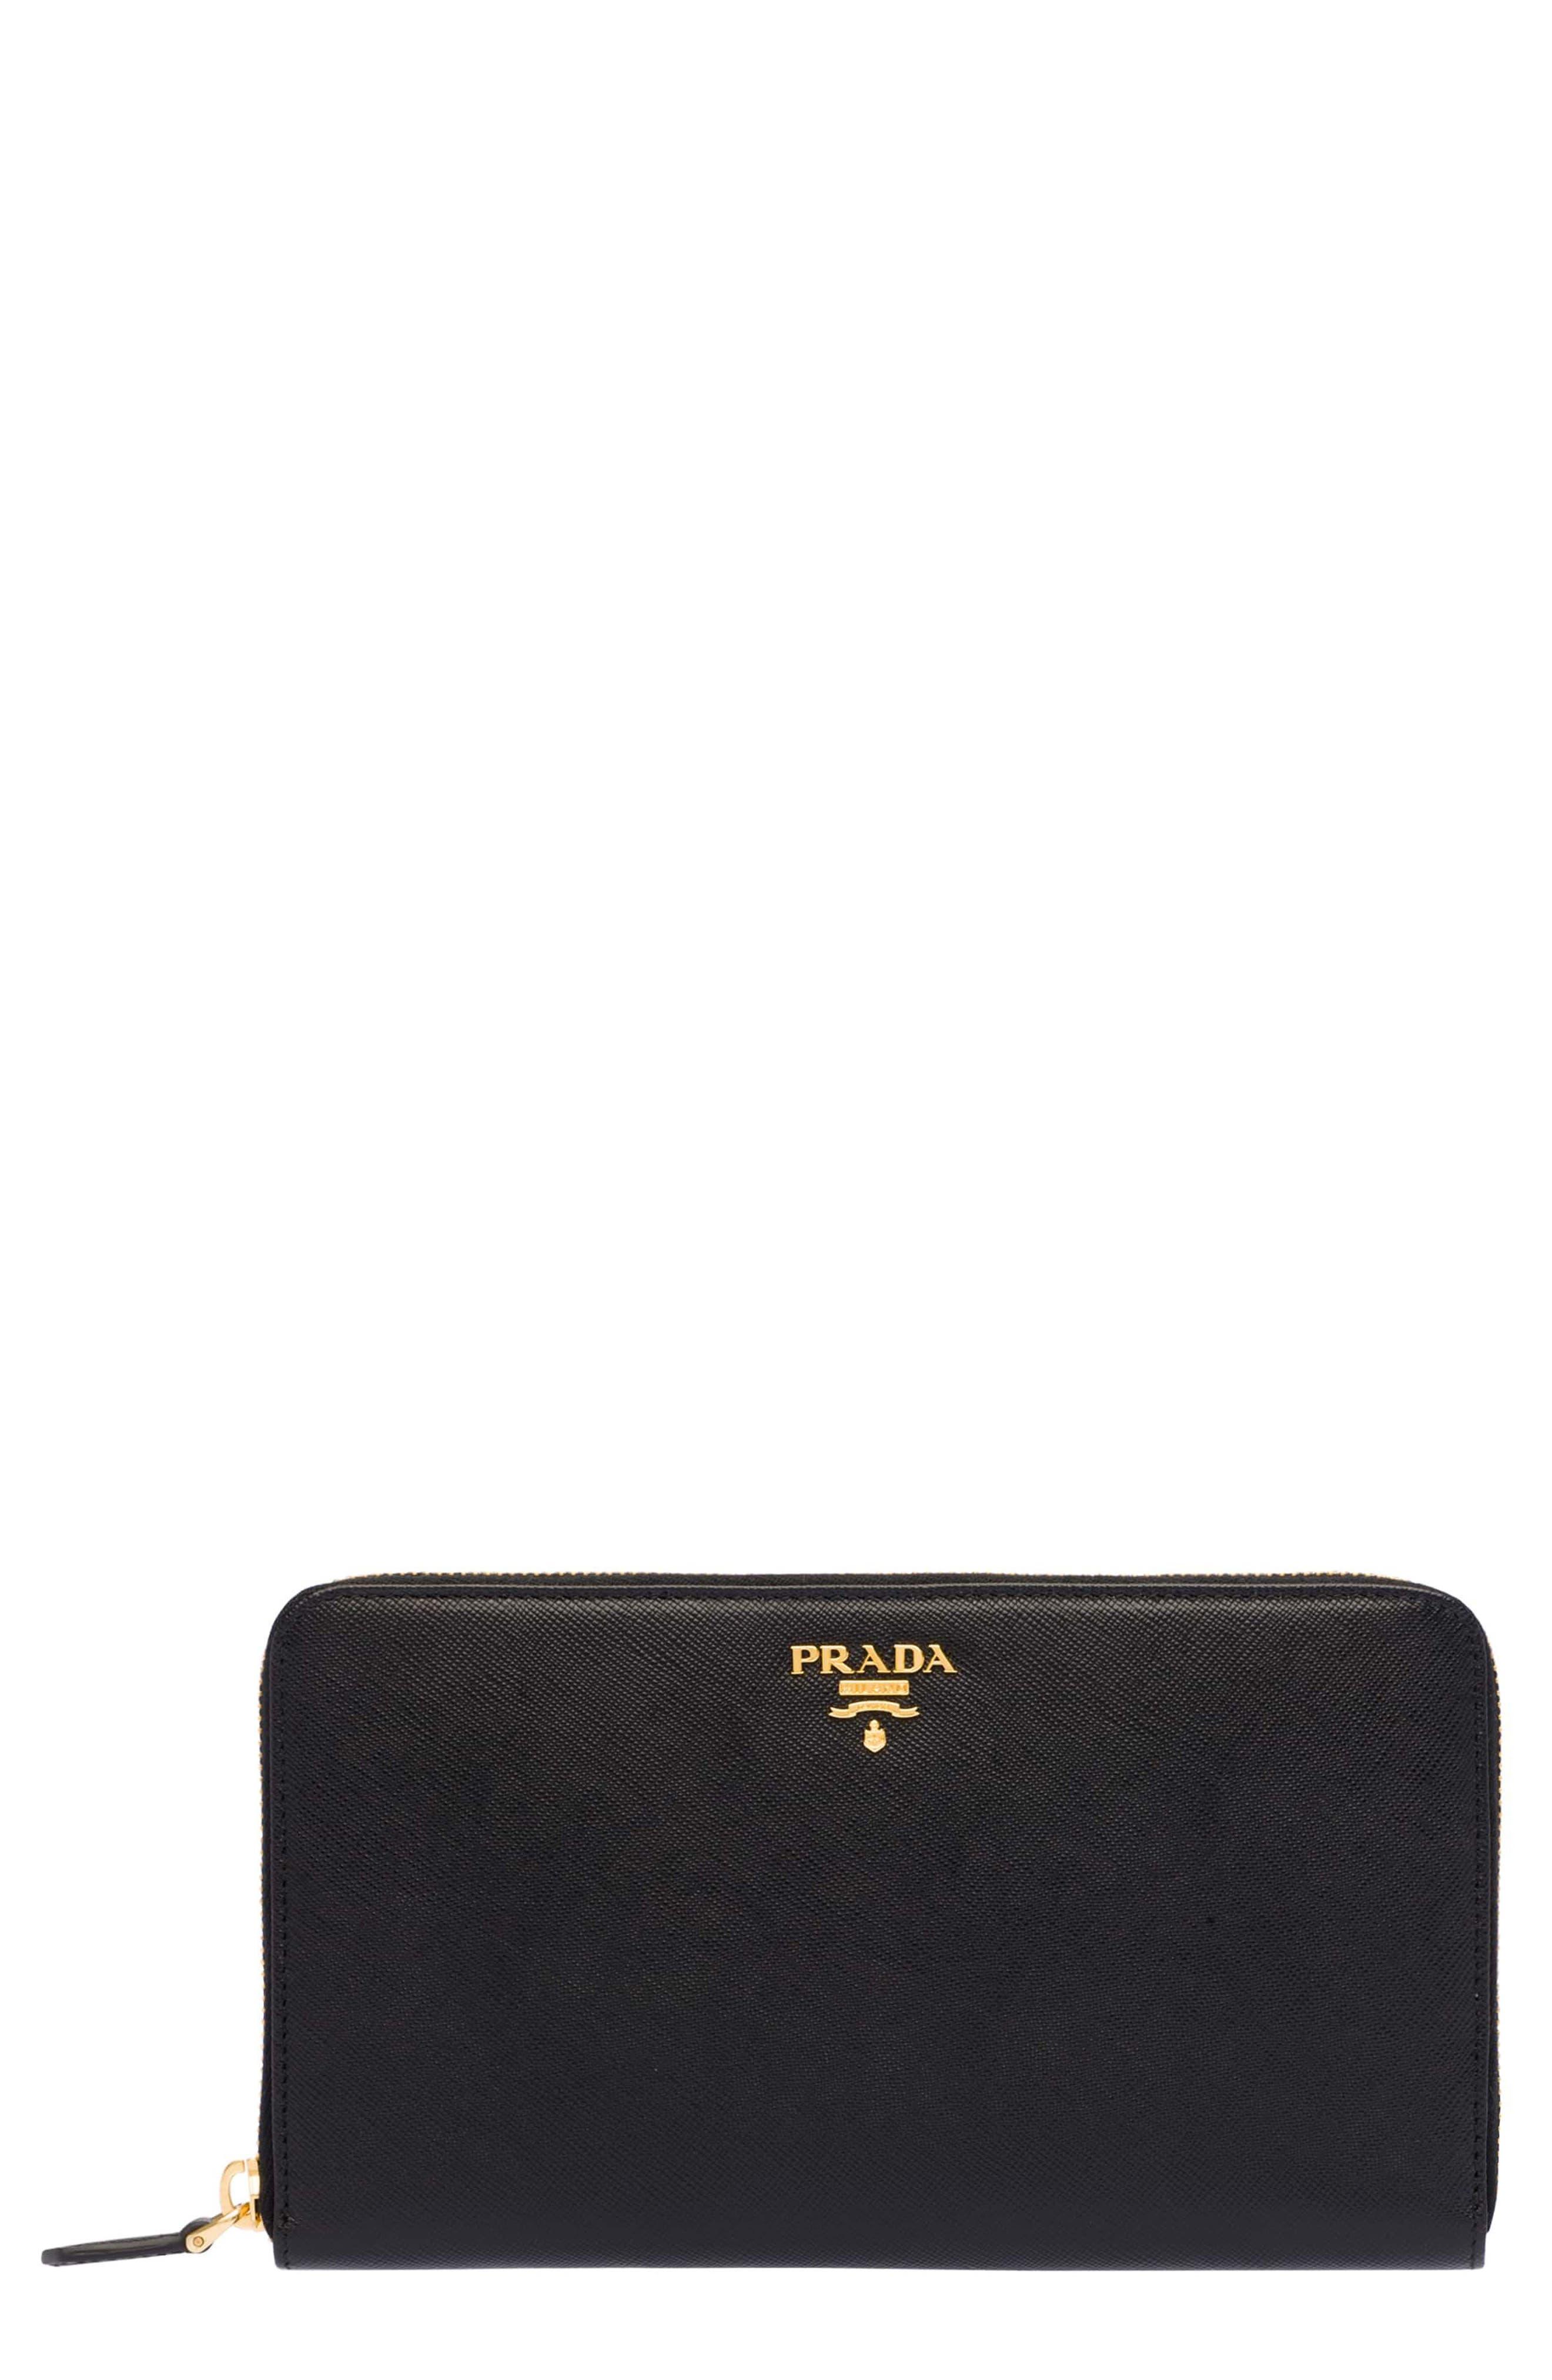 Main Image - Prada Oro Saffiano Leather Zip Around Wallet